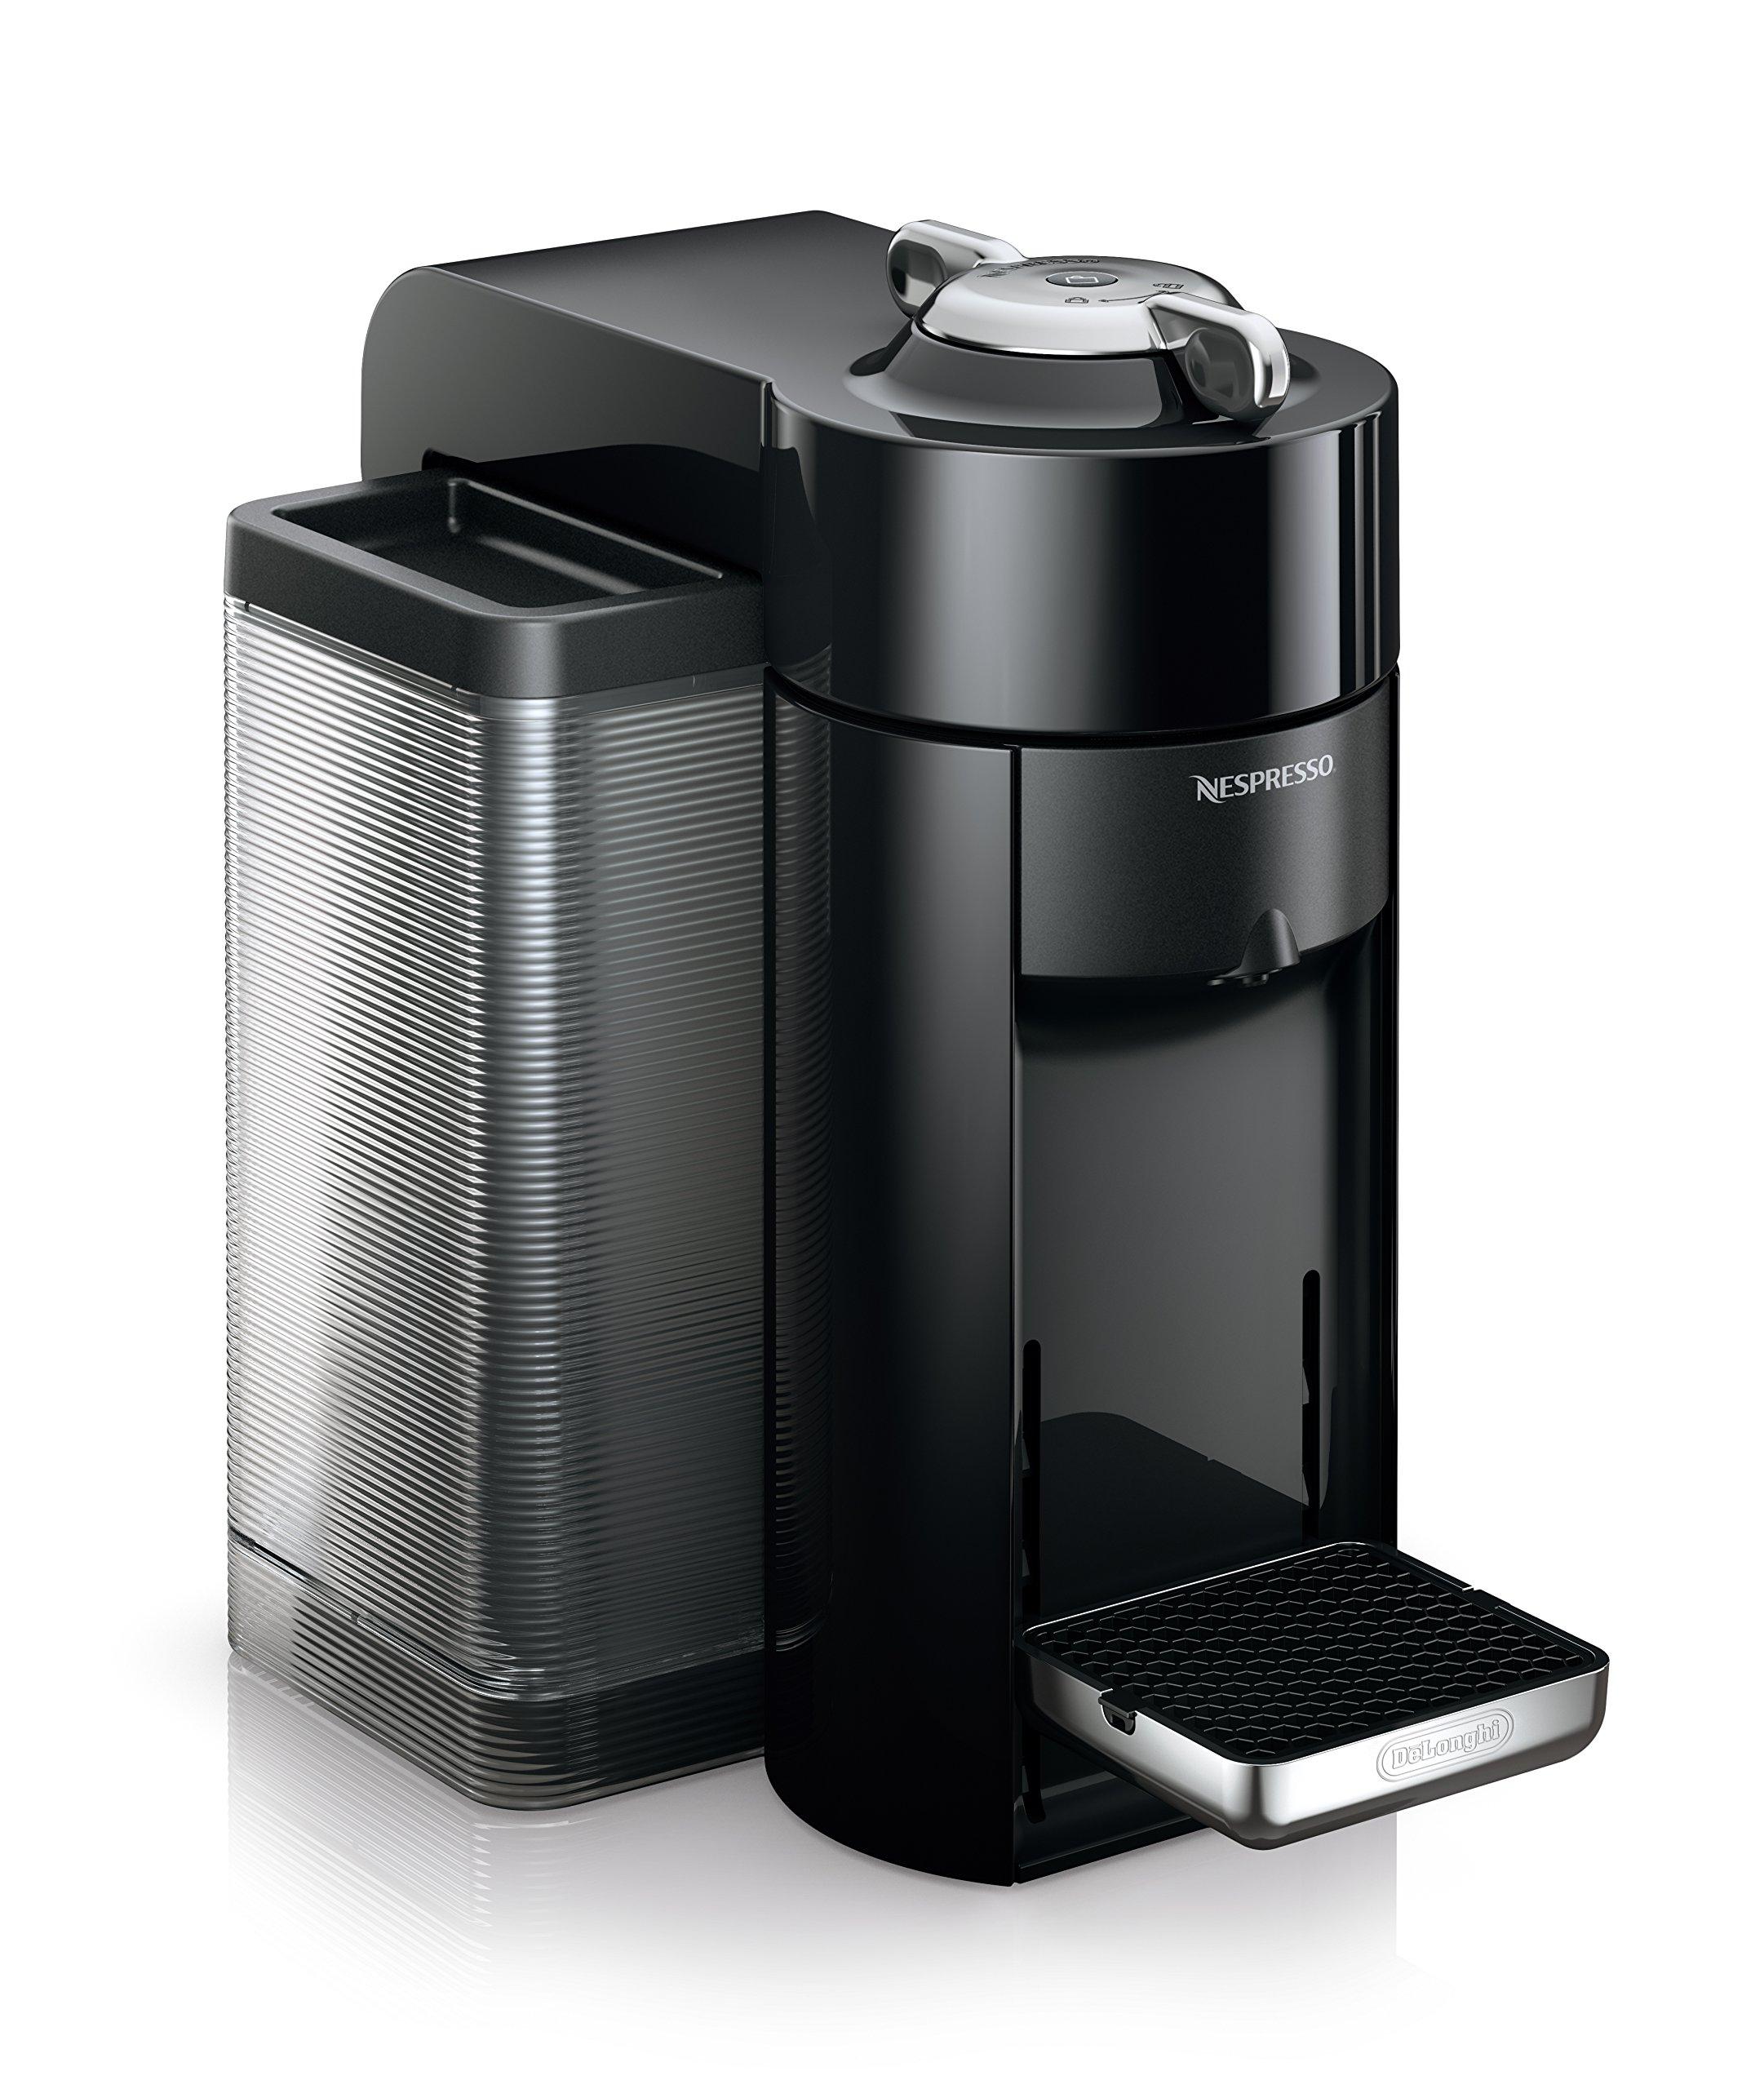 Nespresso-by-De-039-Longhi-Vertuo-ENV135B-Coffee-and-Espresso-Machine miniature 3